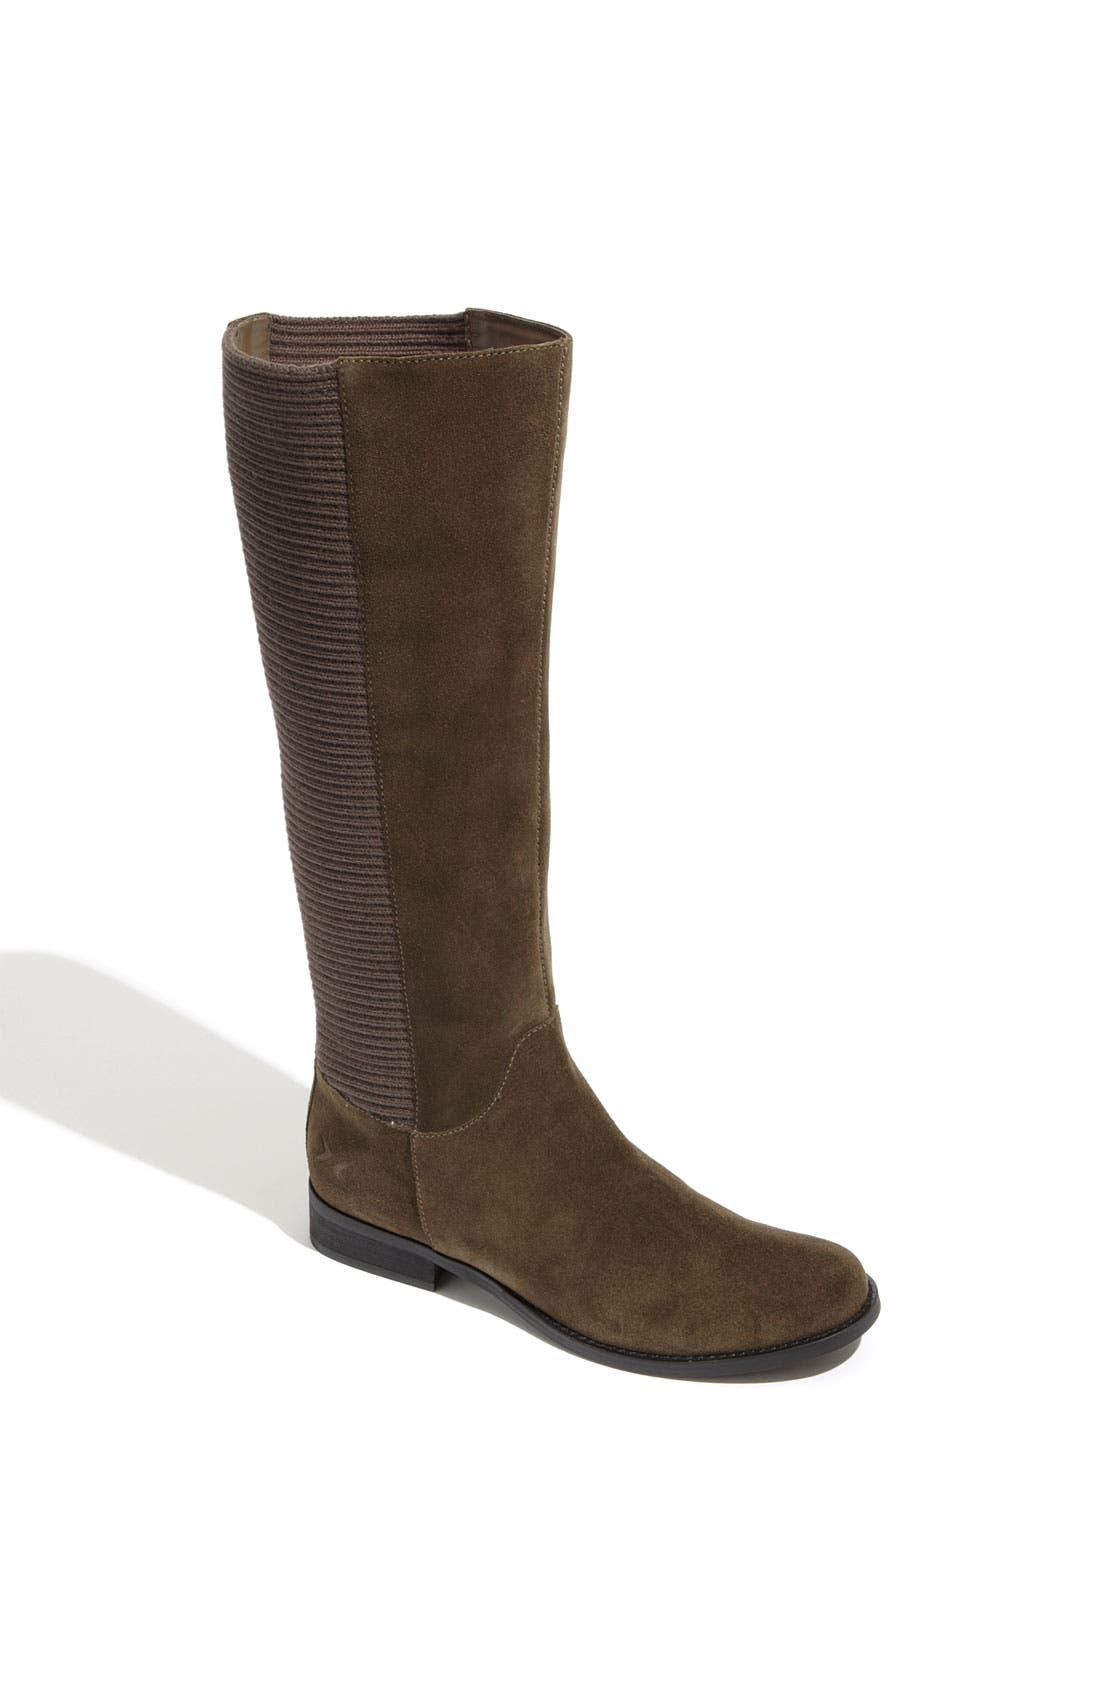 Main Image - Aetrex 'Heather Essence' Boot